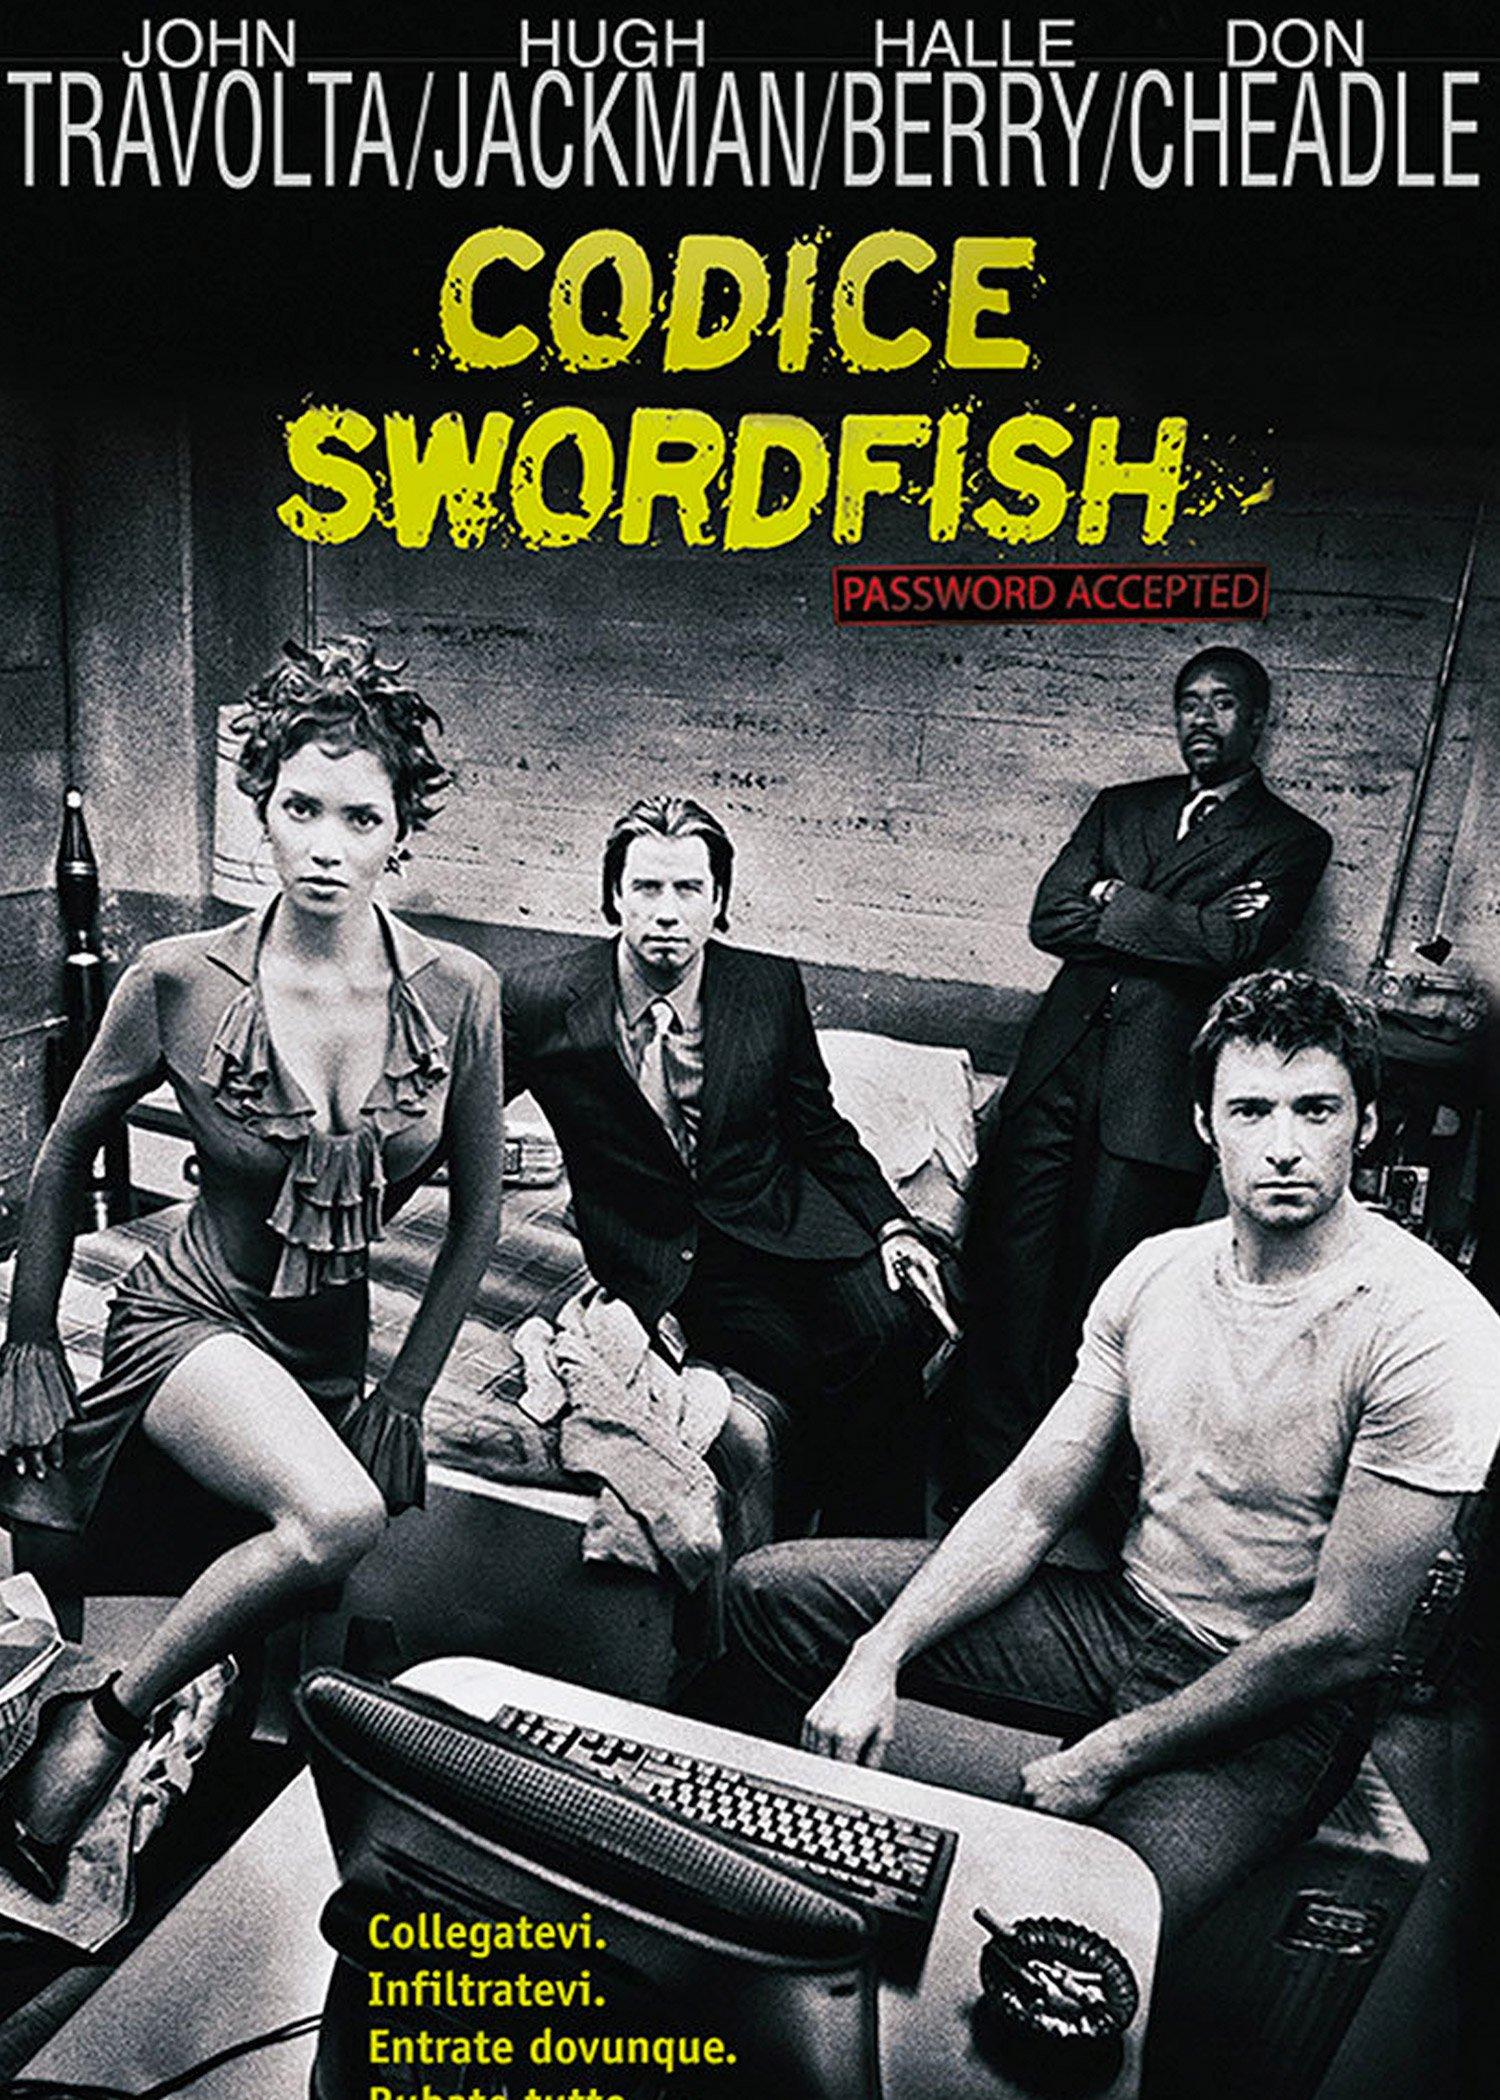 Image of Codice swordfish